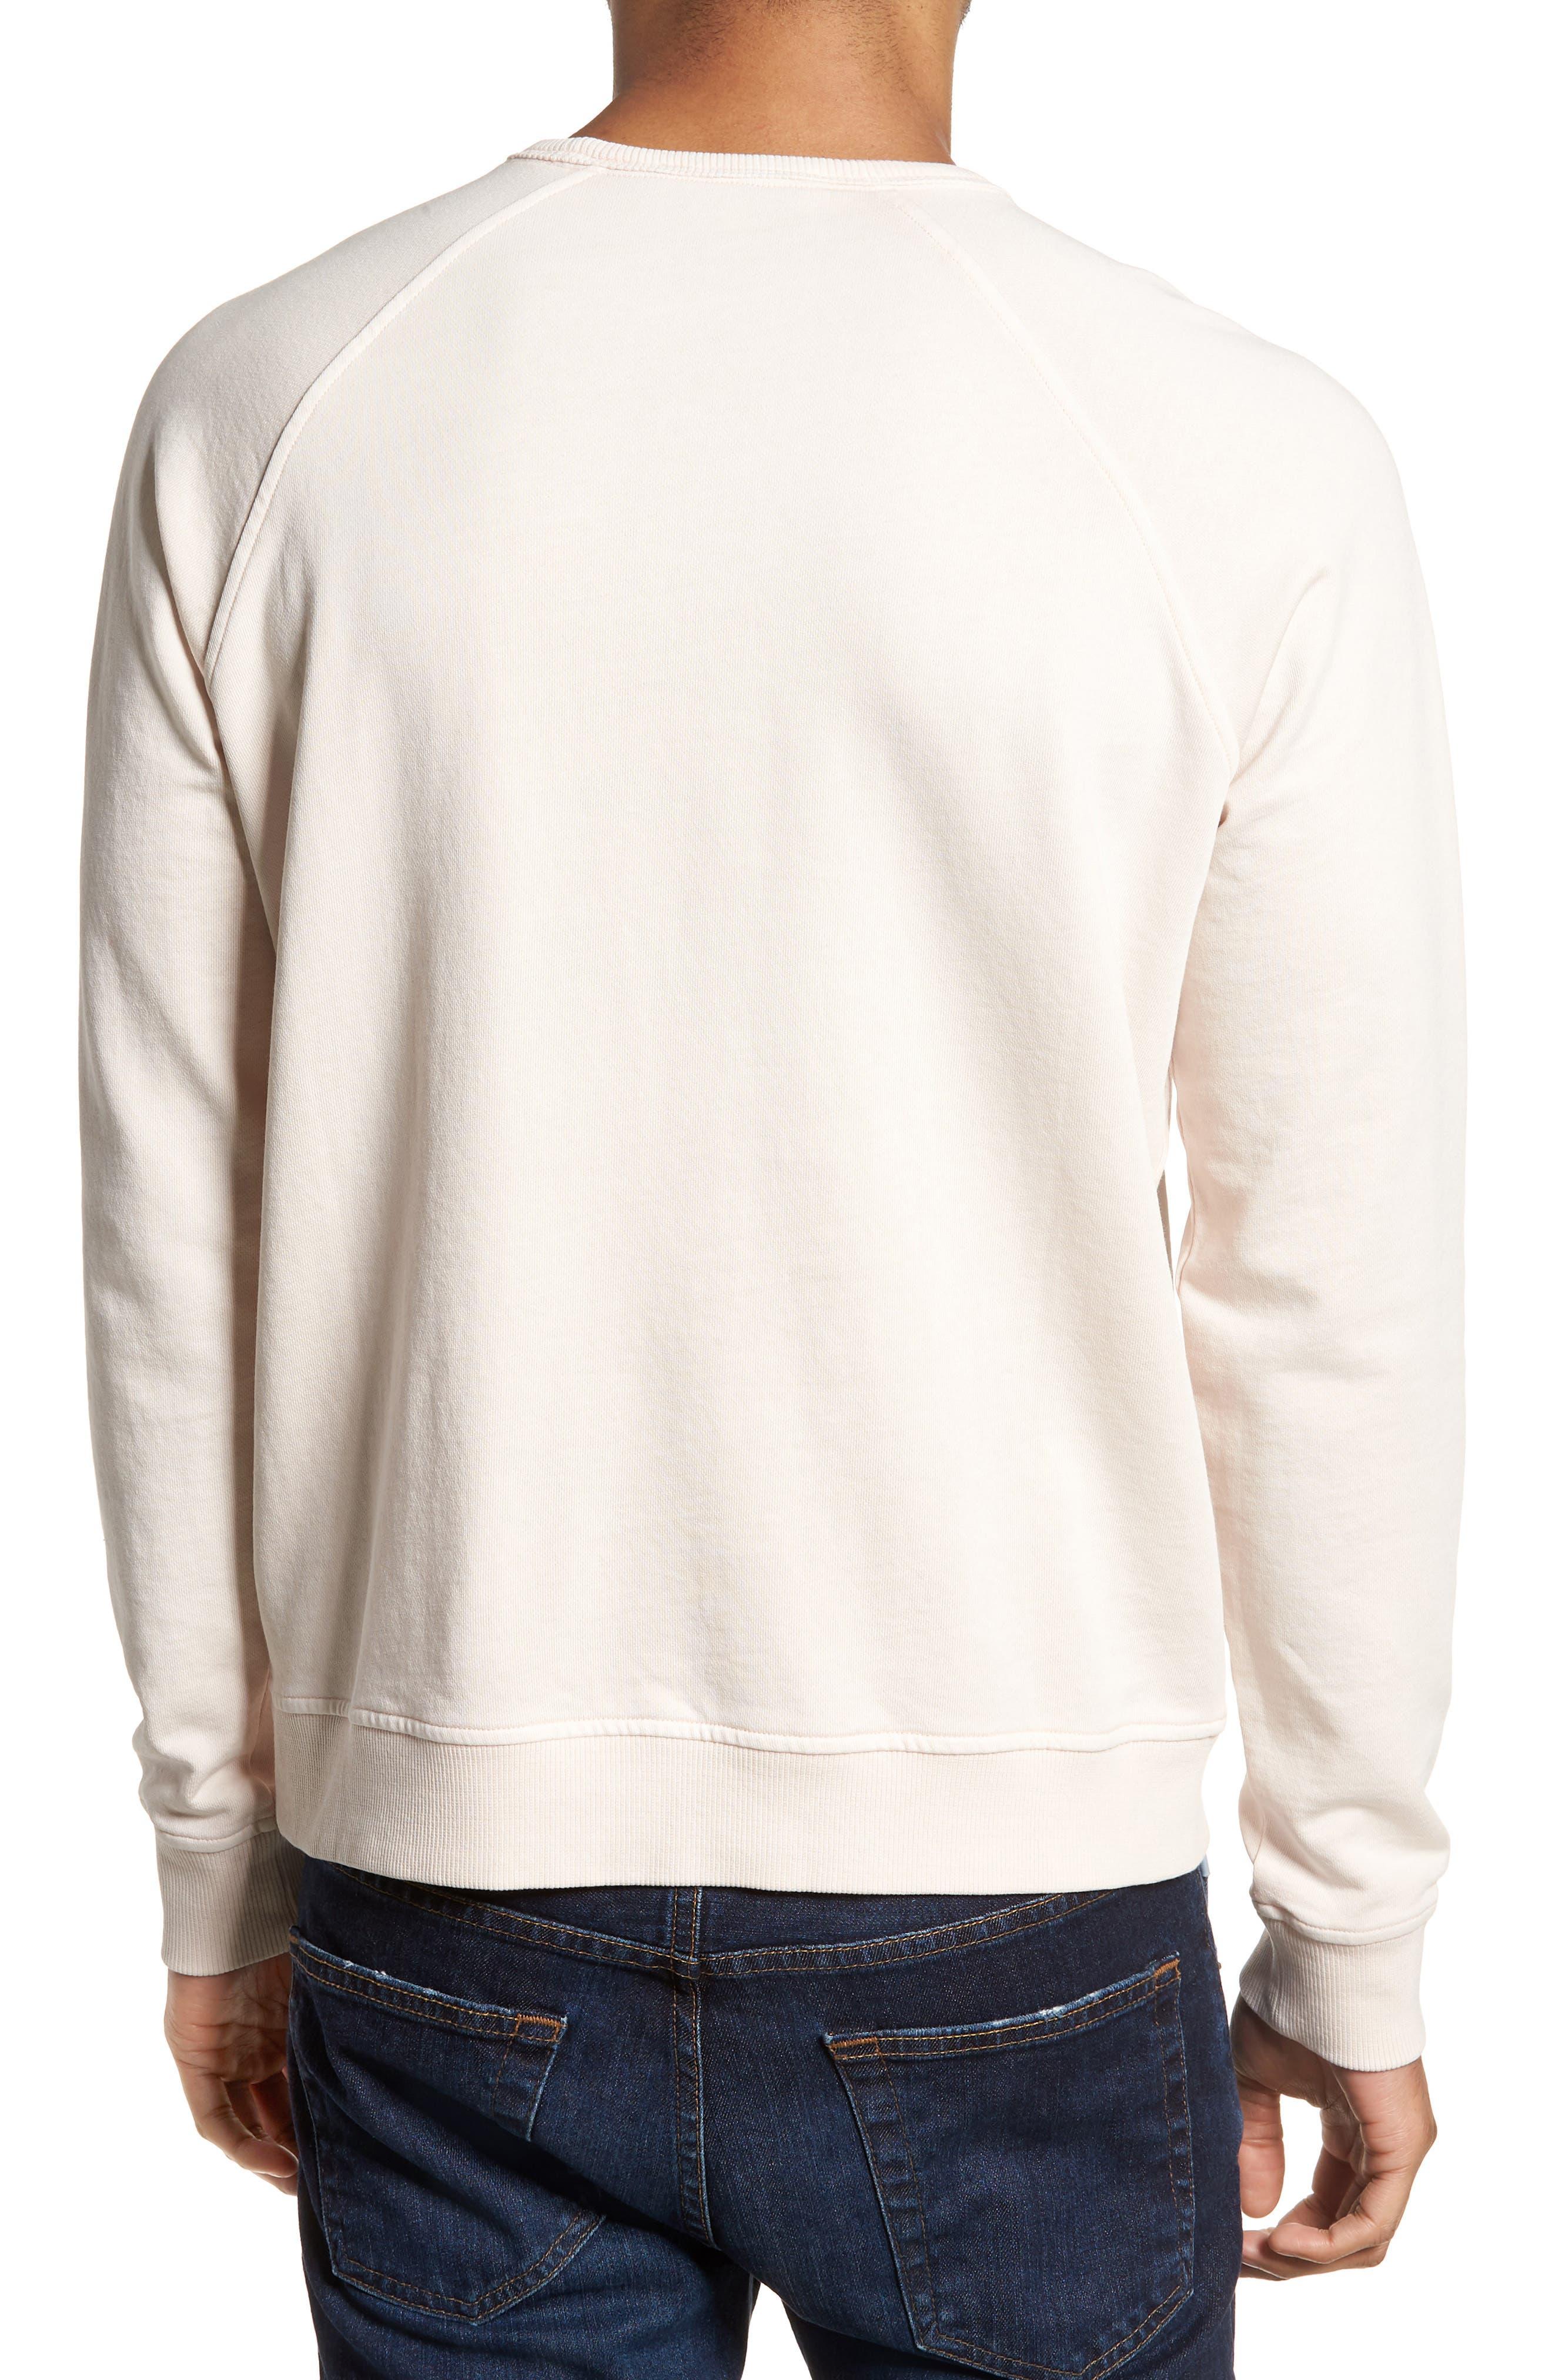 Schrank Raglan Sweatshirt,                             Alternate thumbnail 2, color,                             Pink